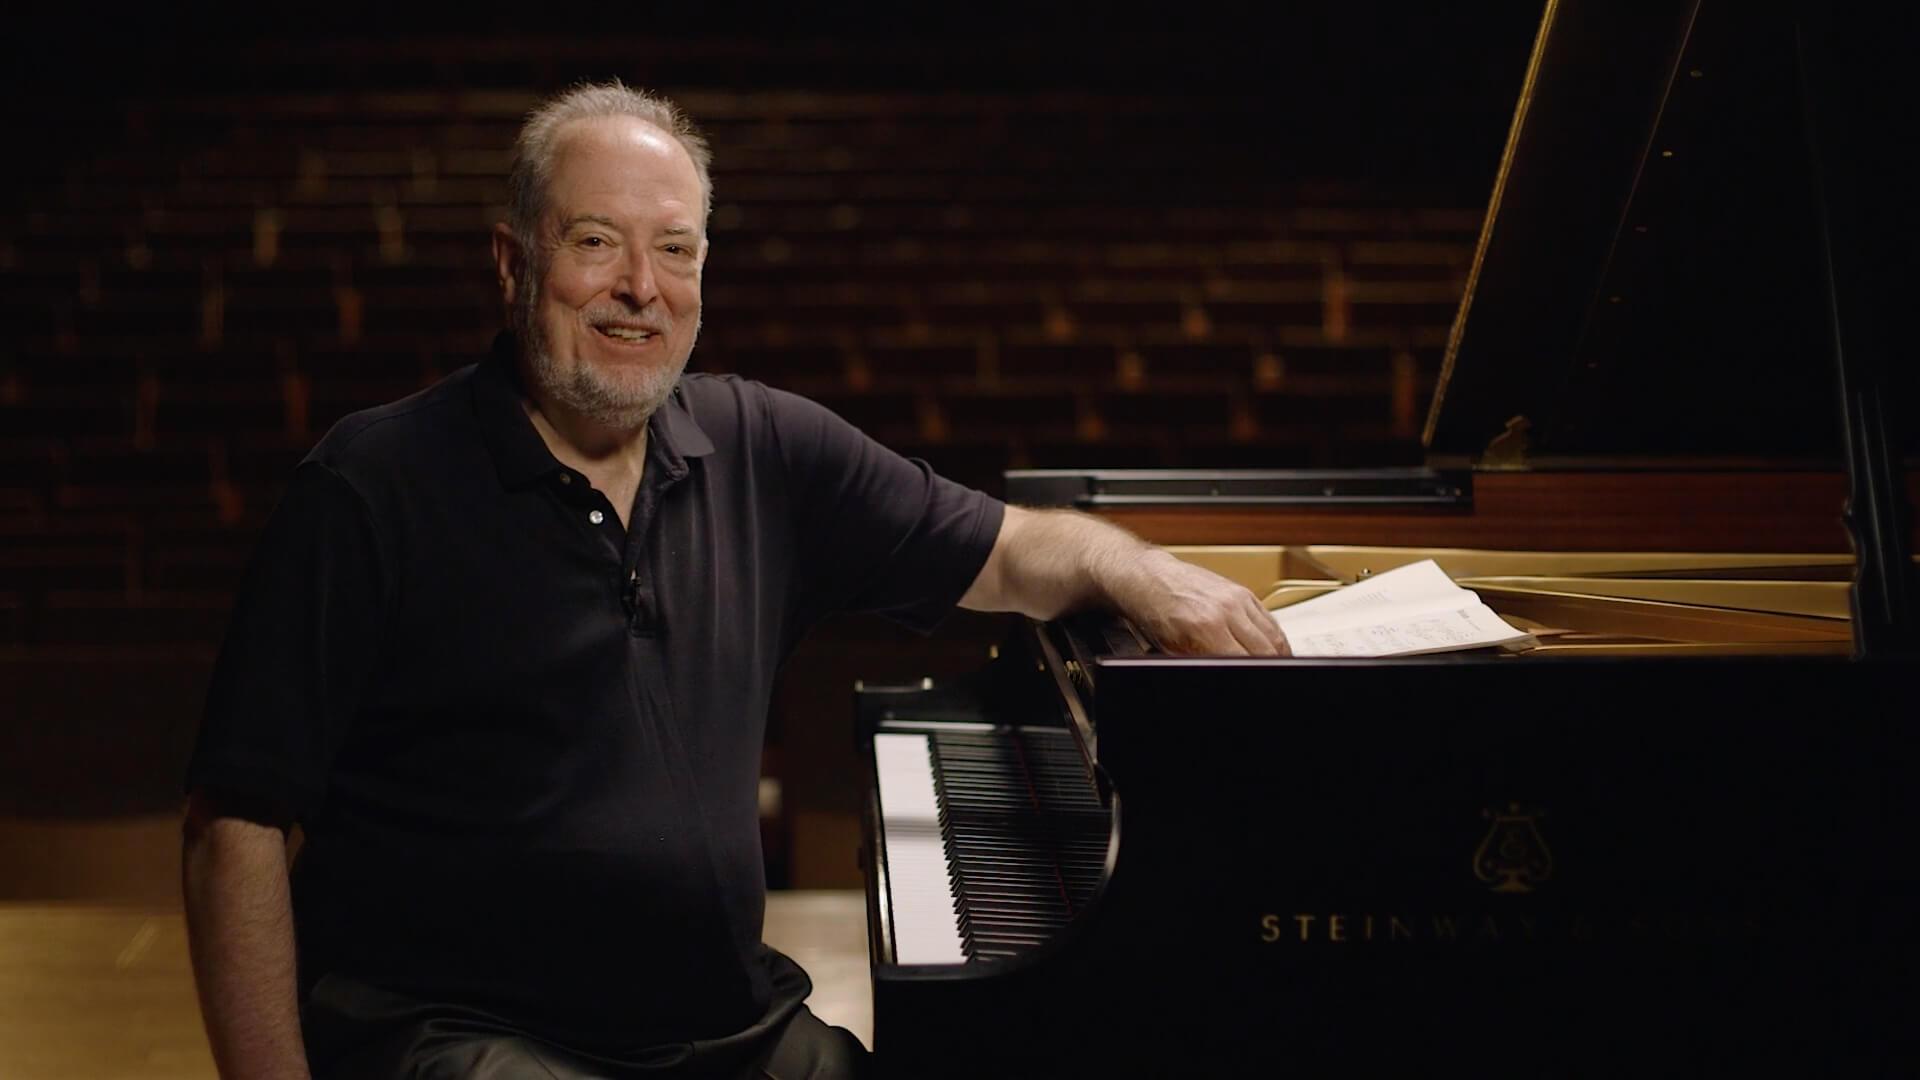 Garrick Ohlsson teaches Chopin on tonebase.